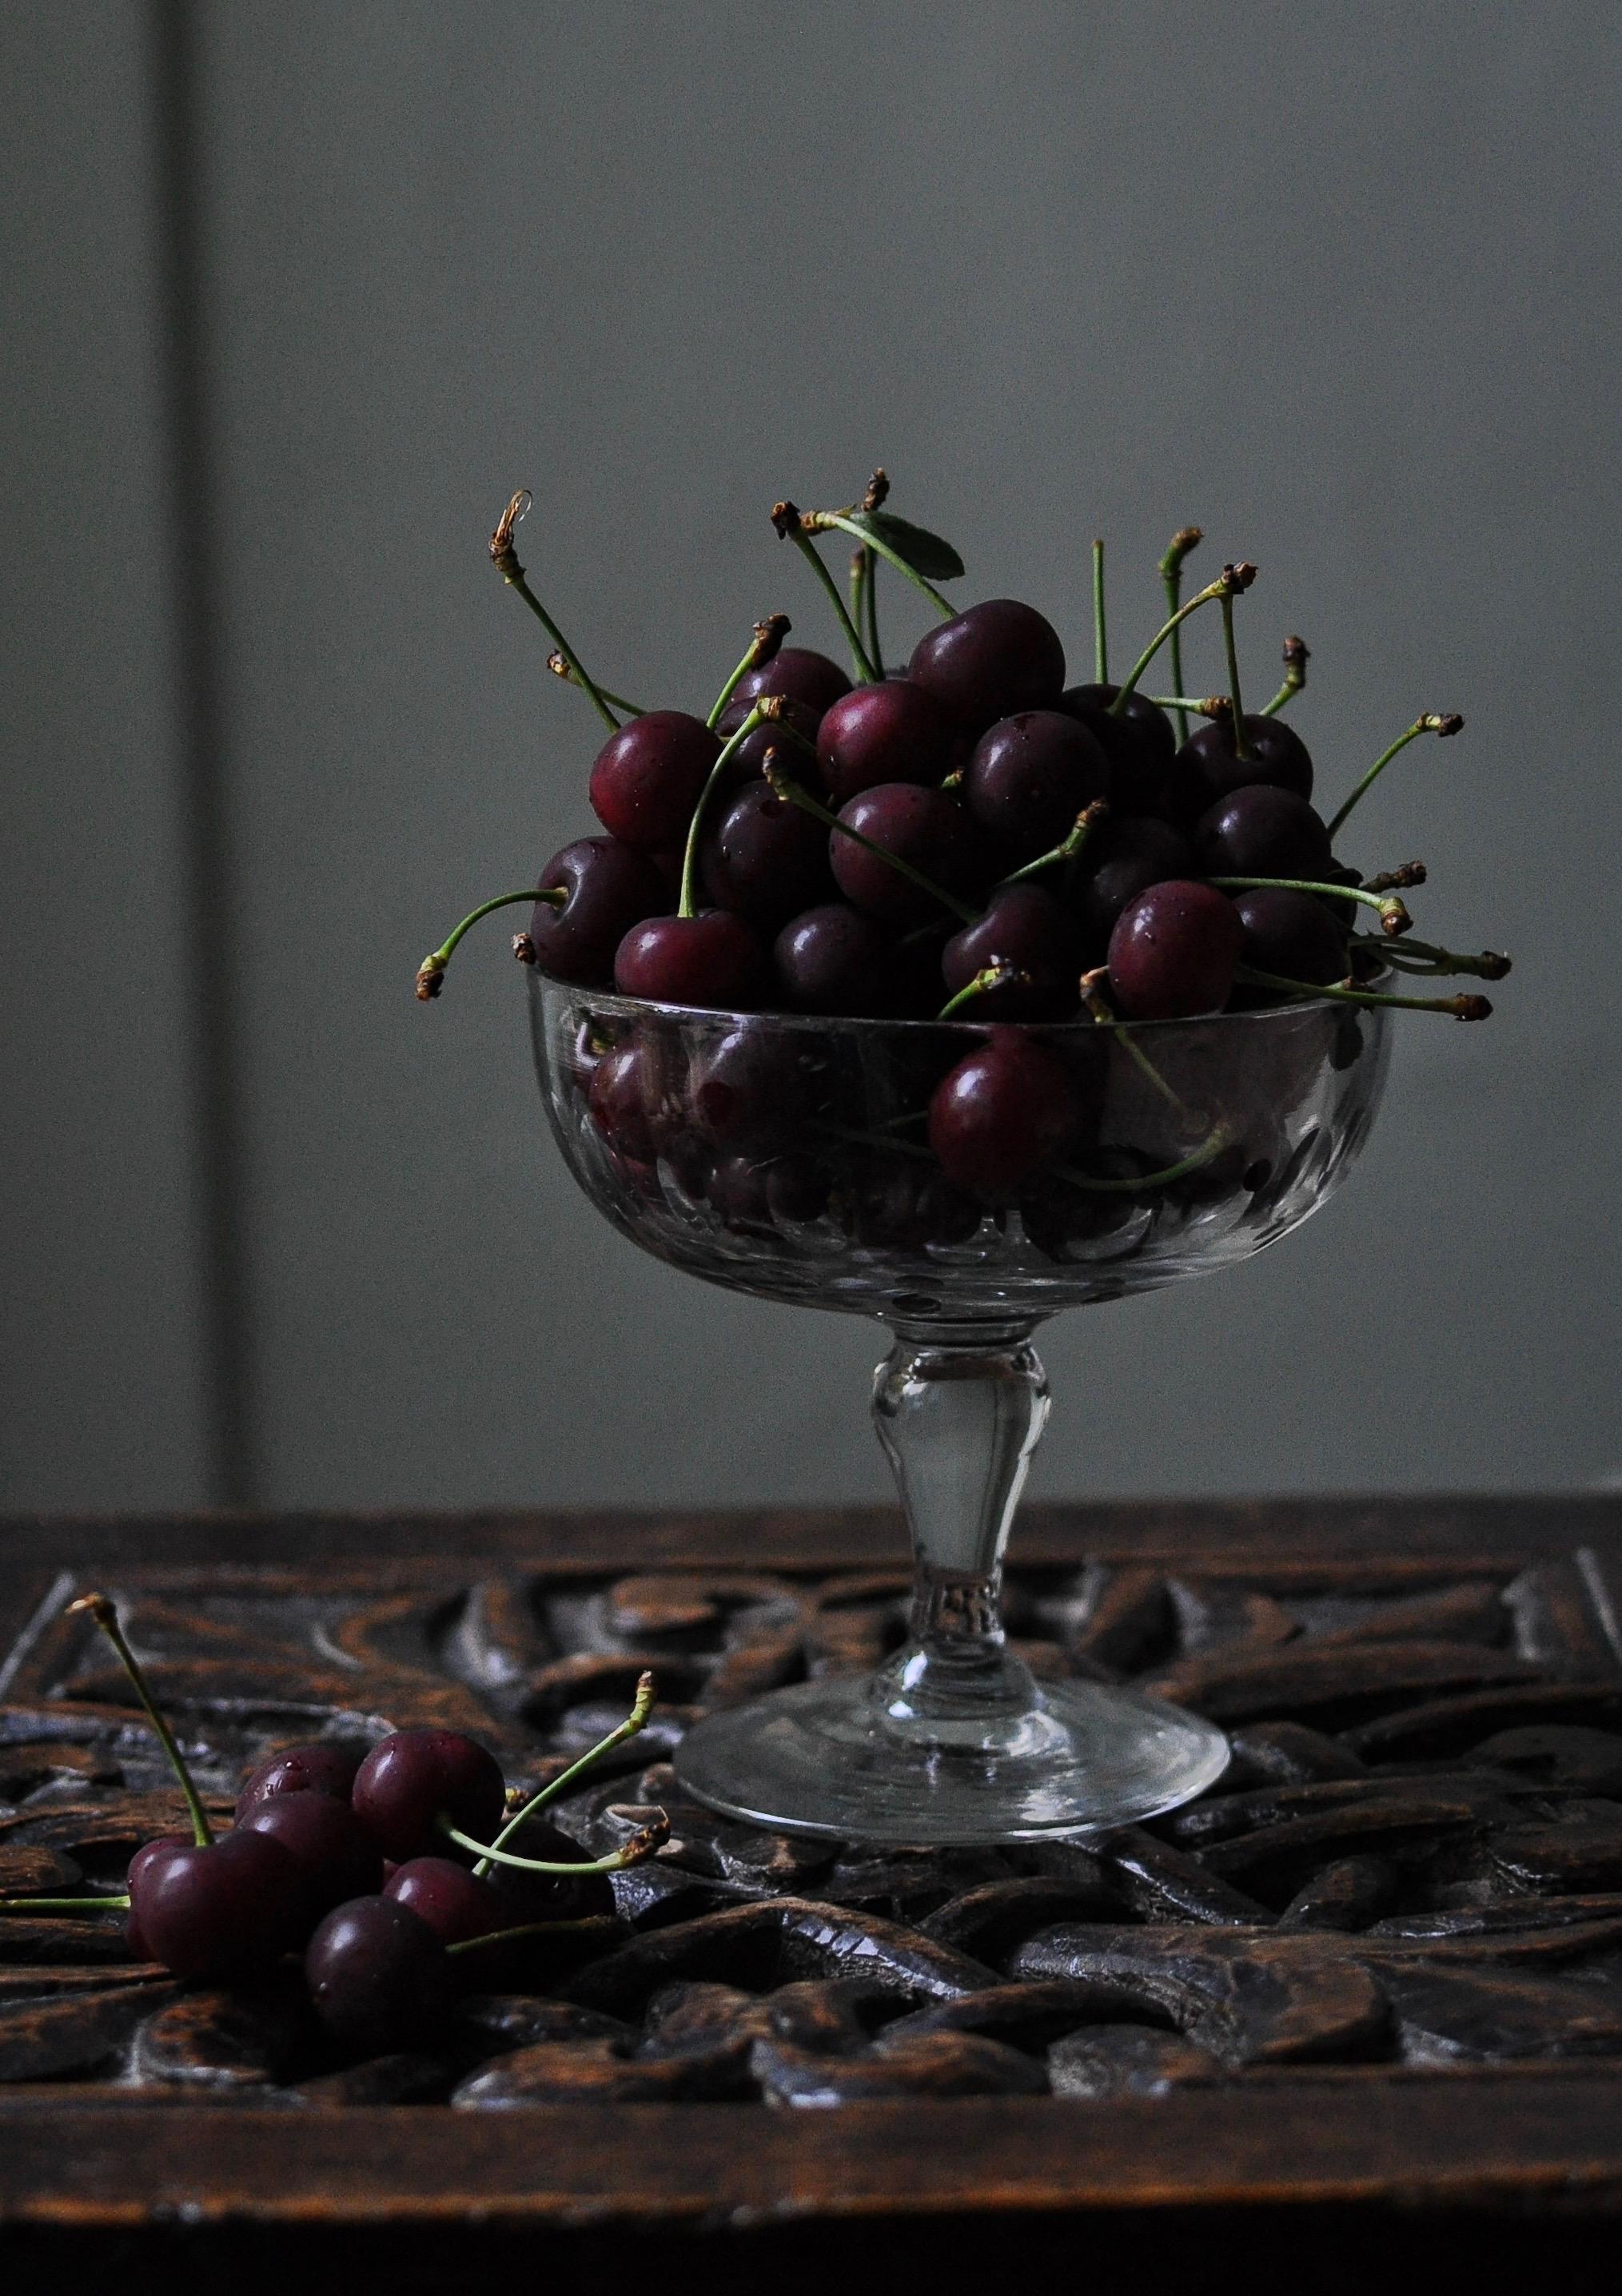 EMOSIWN Cherries 121 Lreddsc_0362.JPG